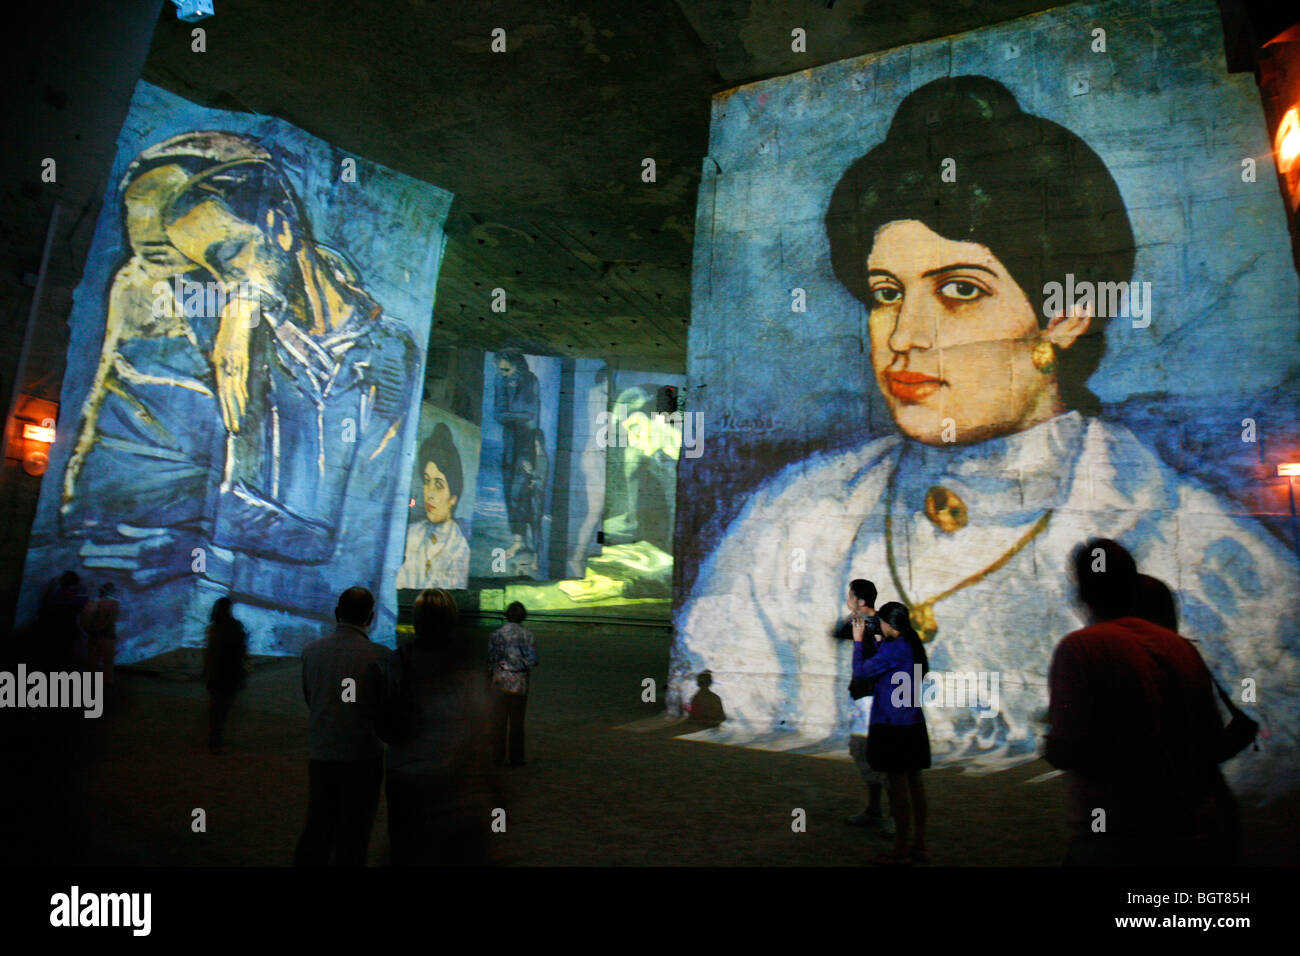 Spettacolo multimediale all'interno la Cathedrale des Images, Les Baux de Provence, Bouches-du-Rhone, Provenza, Immagini Stock